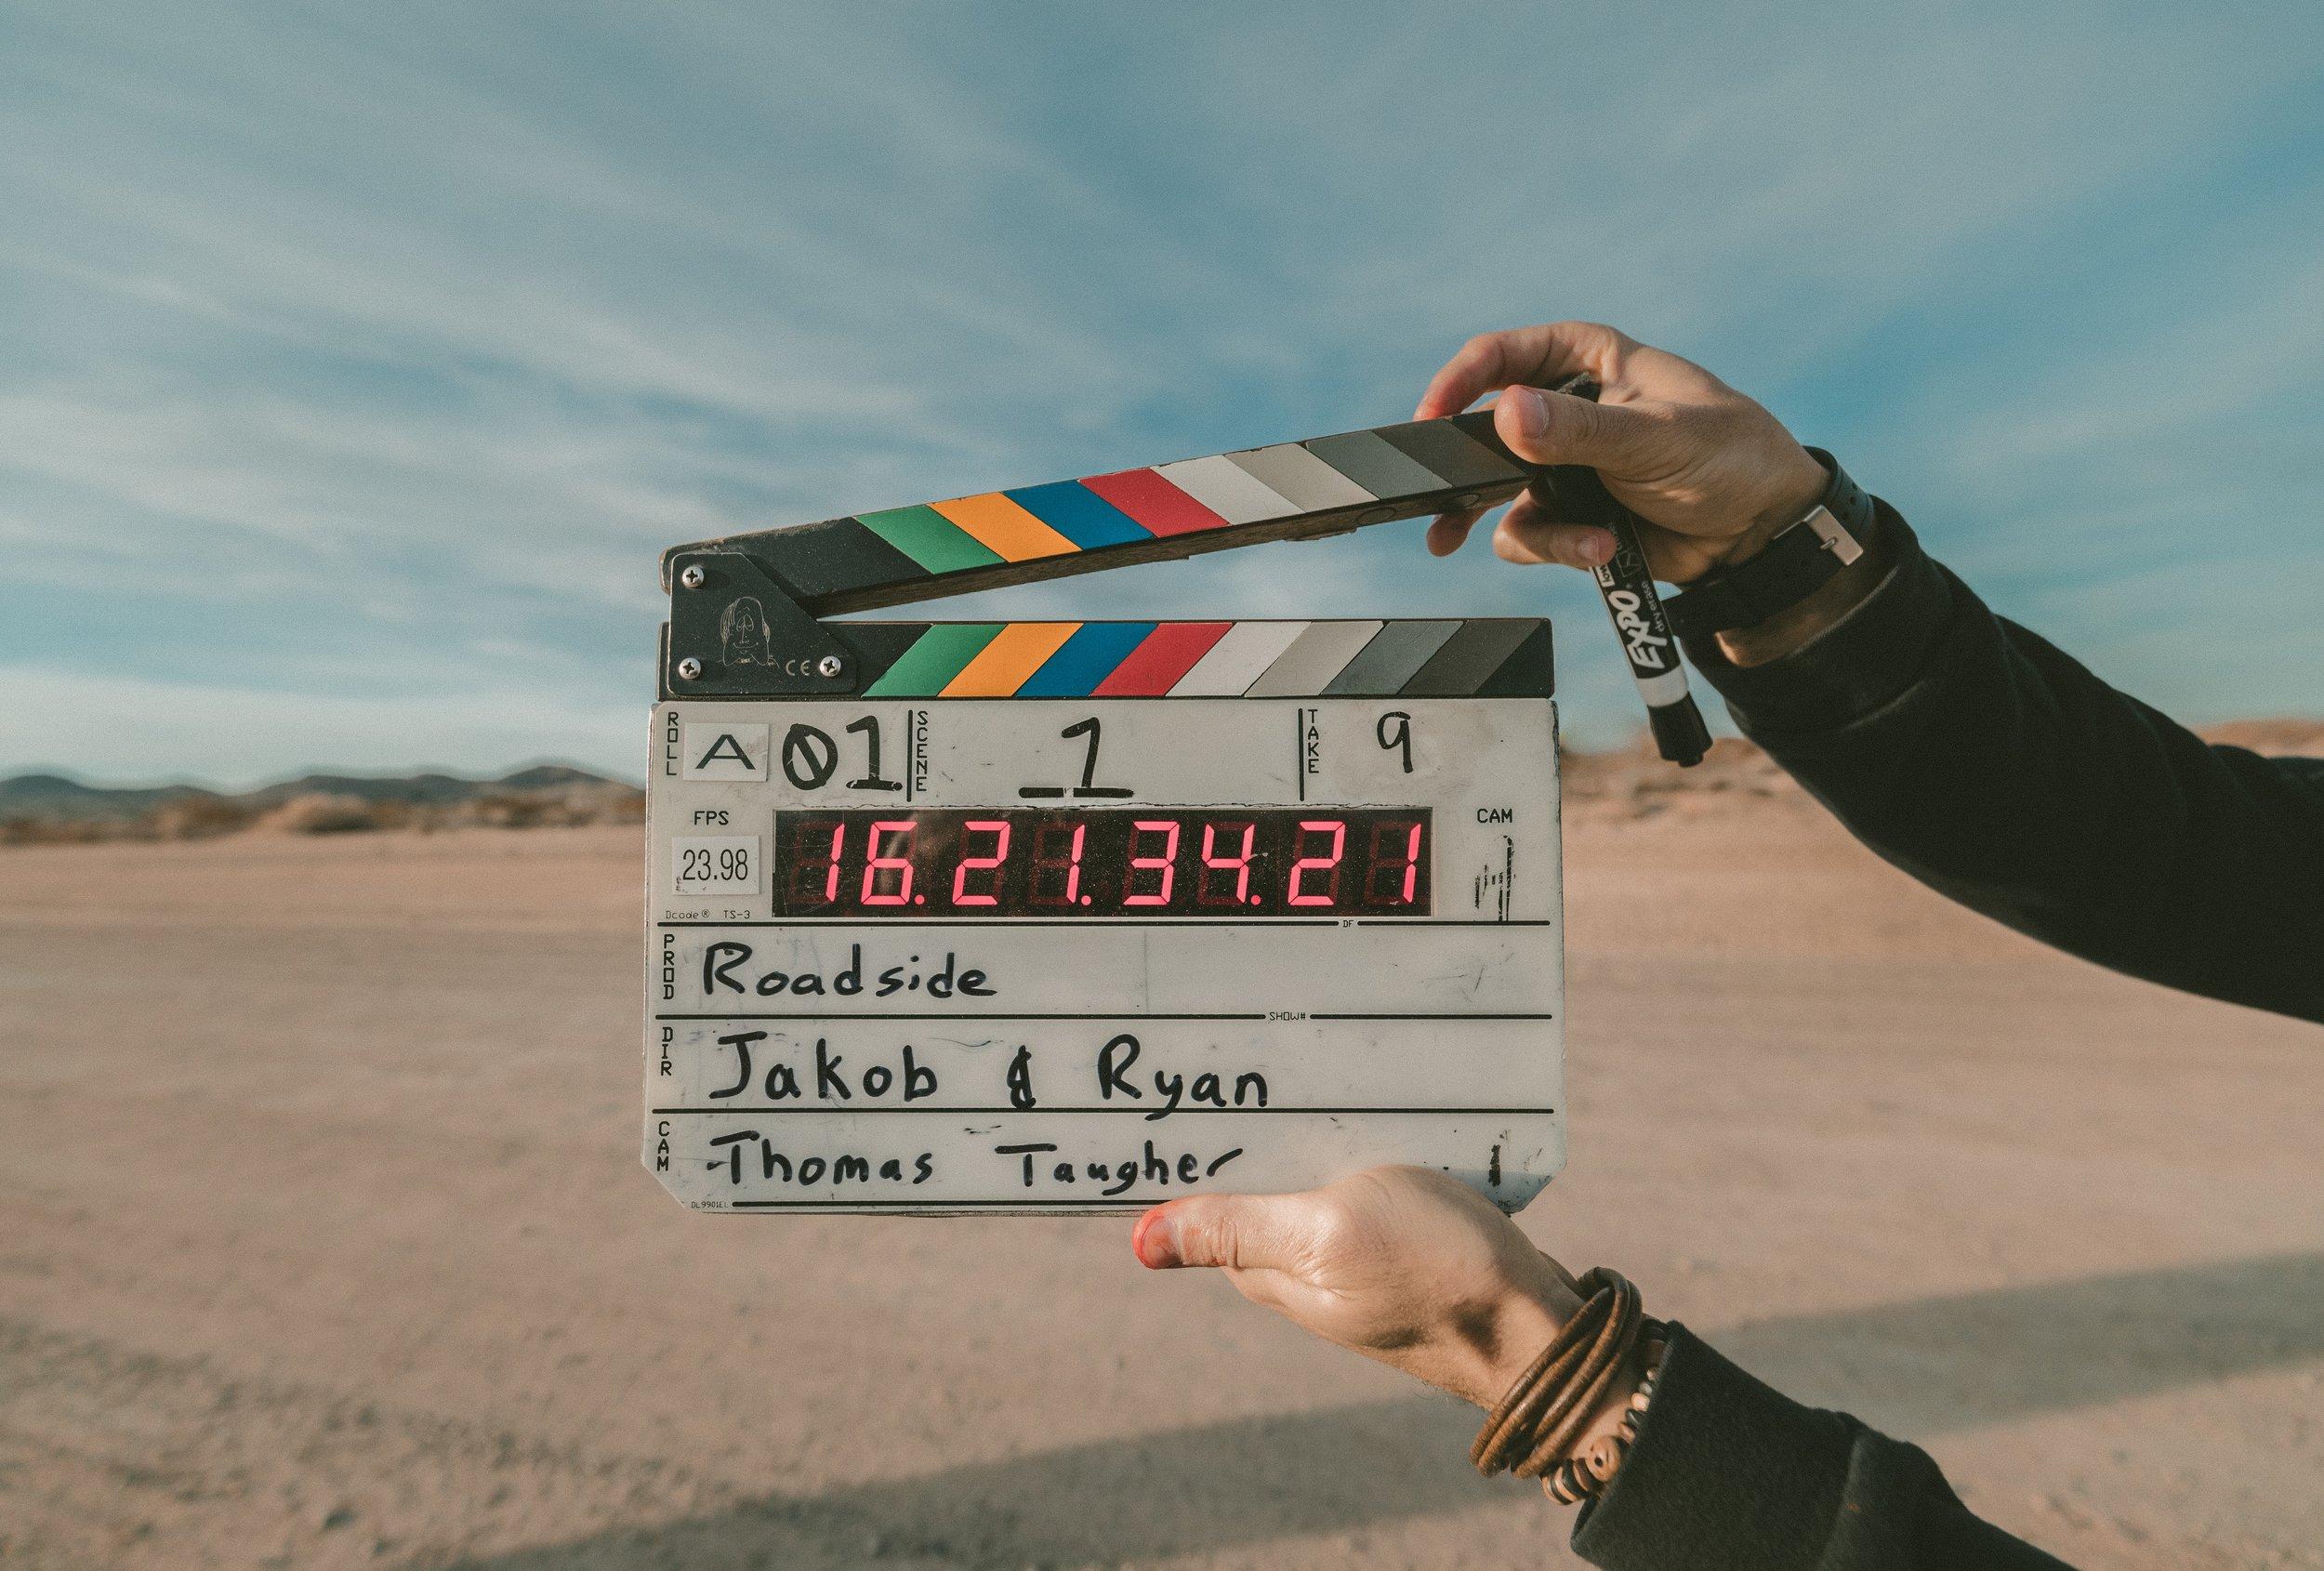 LA // Trailer Release Party // November 2nd, 2017  - Public trailer screening event @ WeWork Culver City